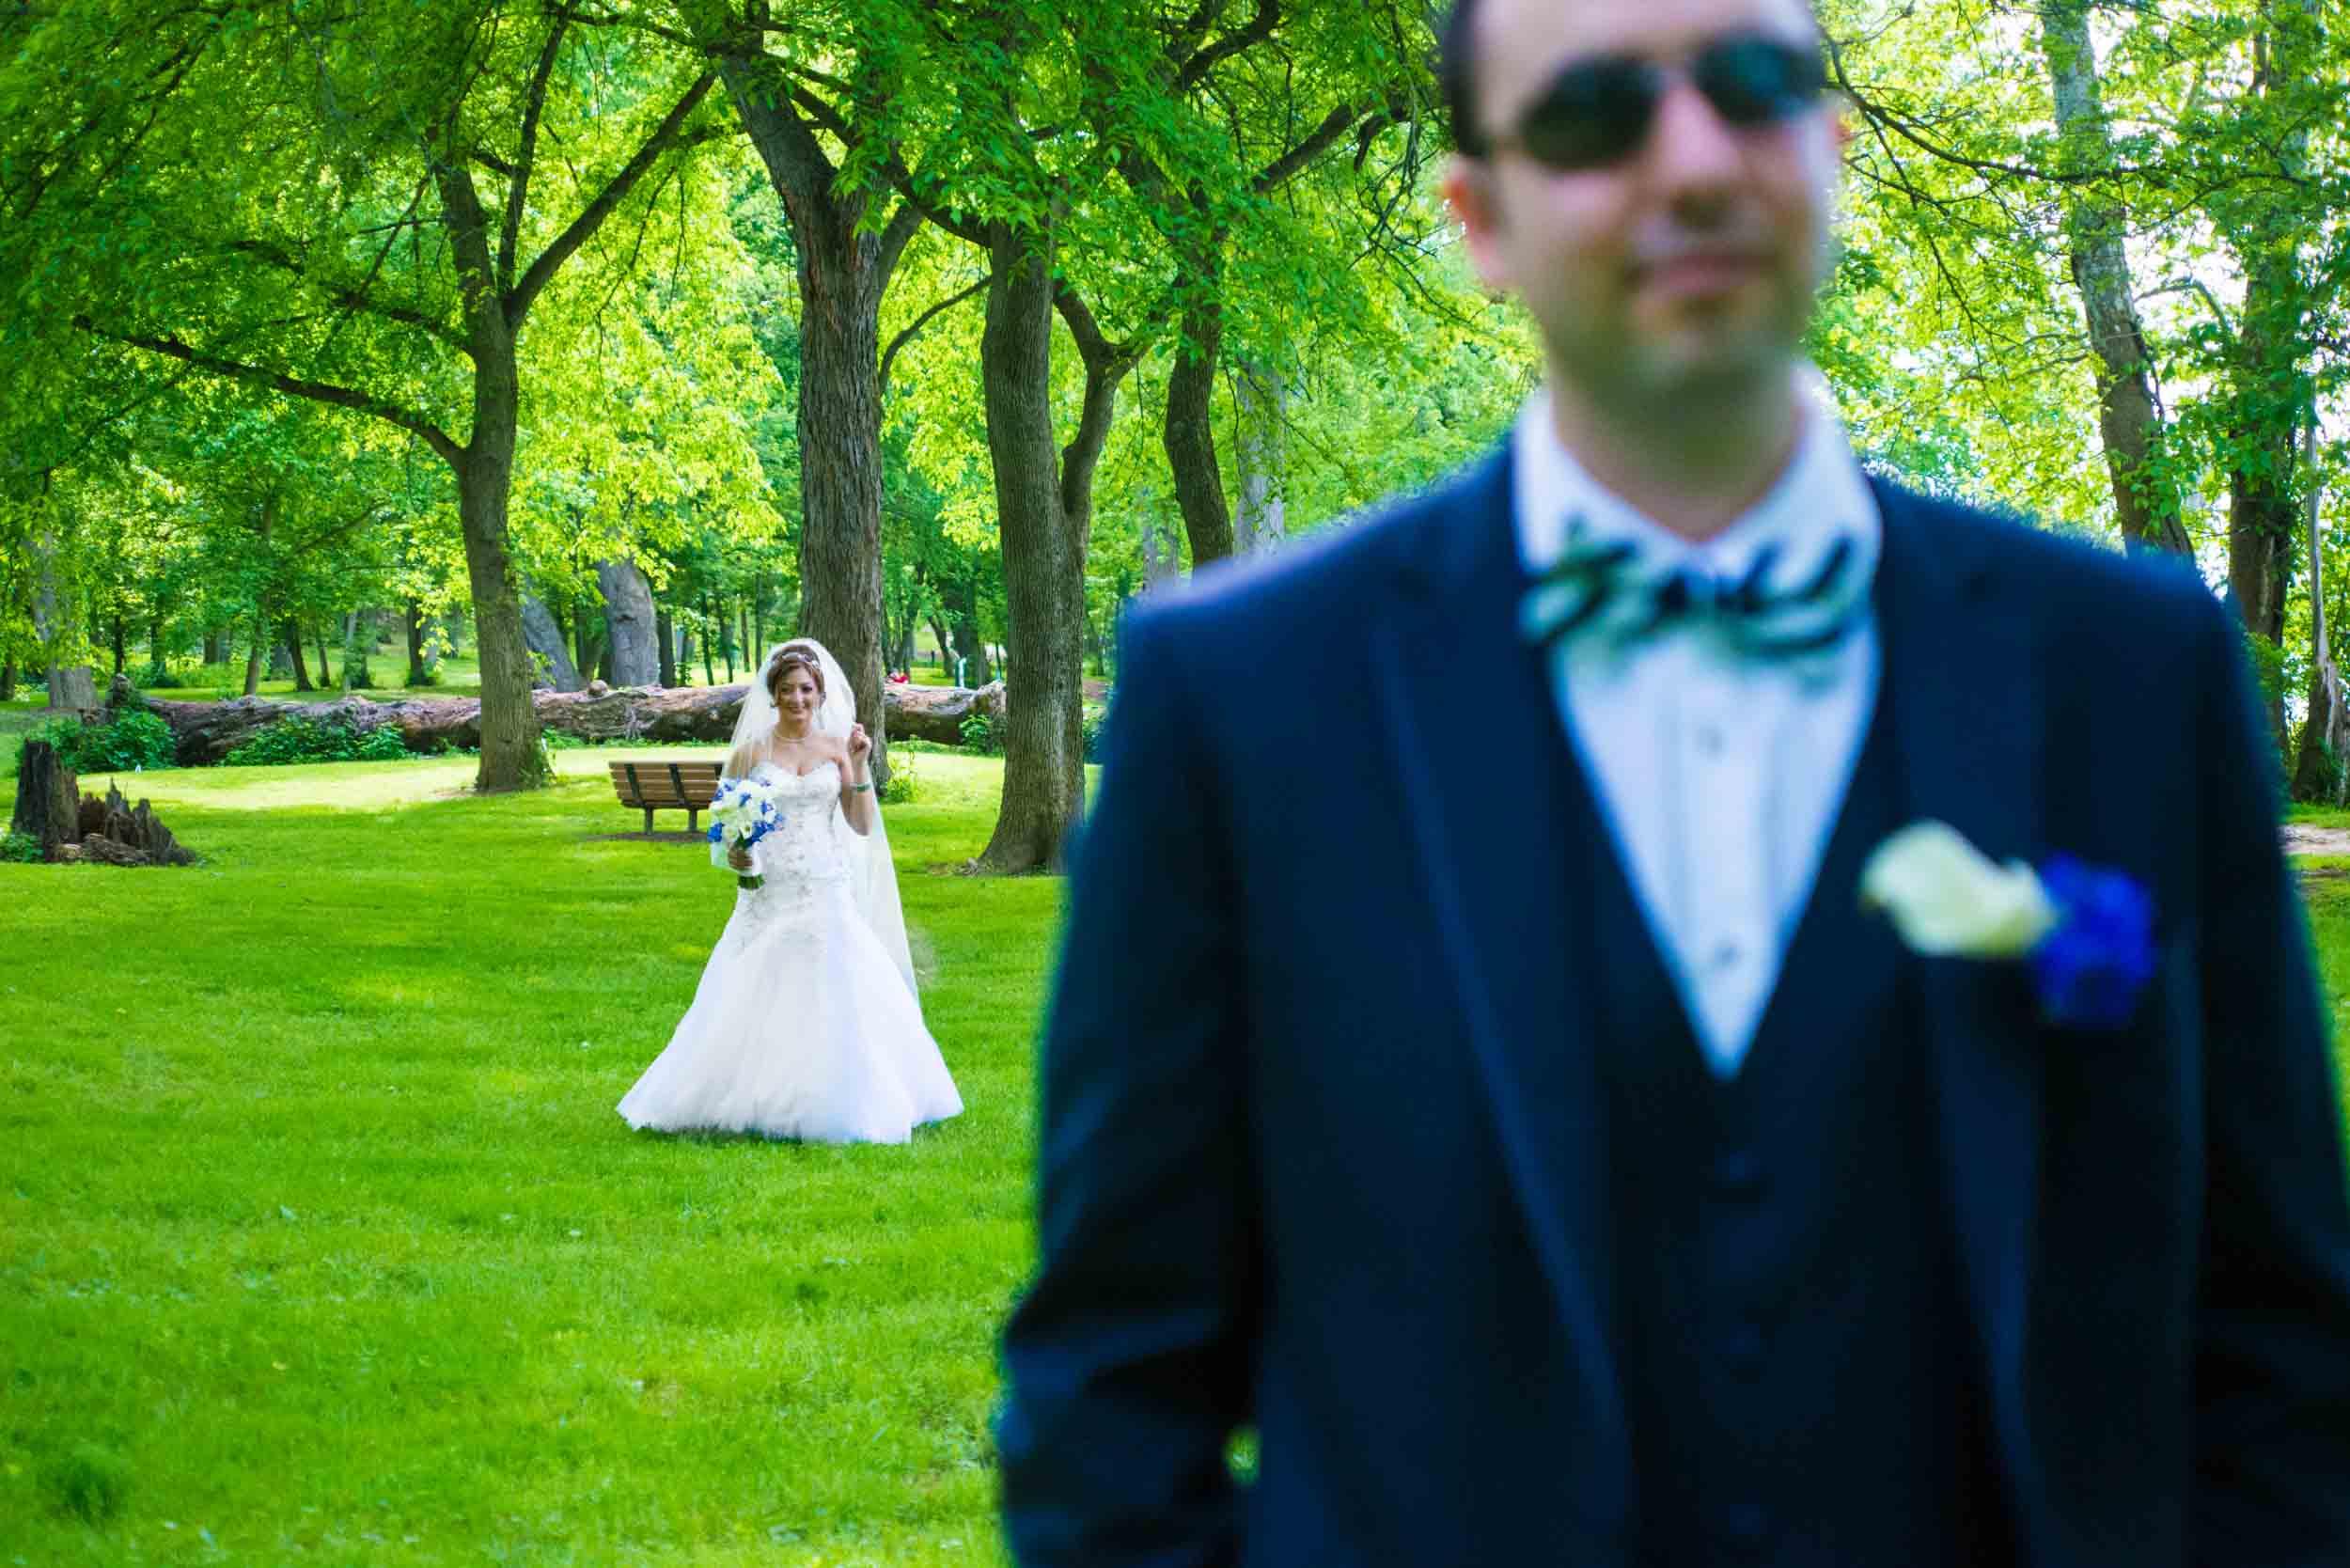 dc+metro+wedding+photographer+vadym+guliuk+photography+weddings+first-look-2020.jpg